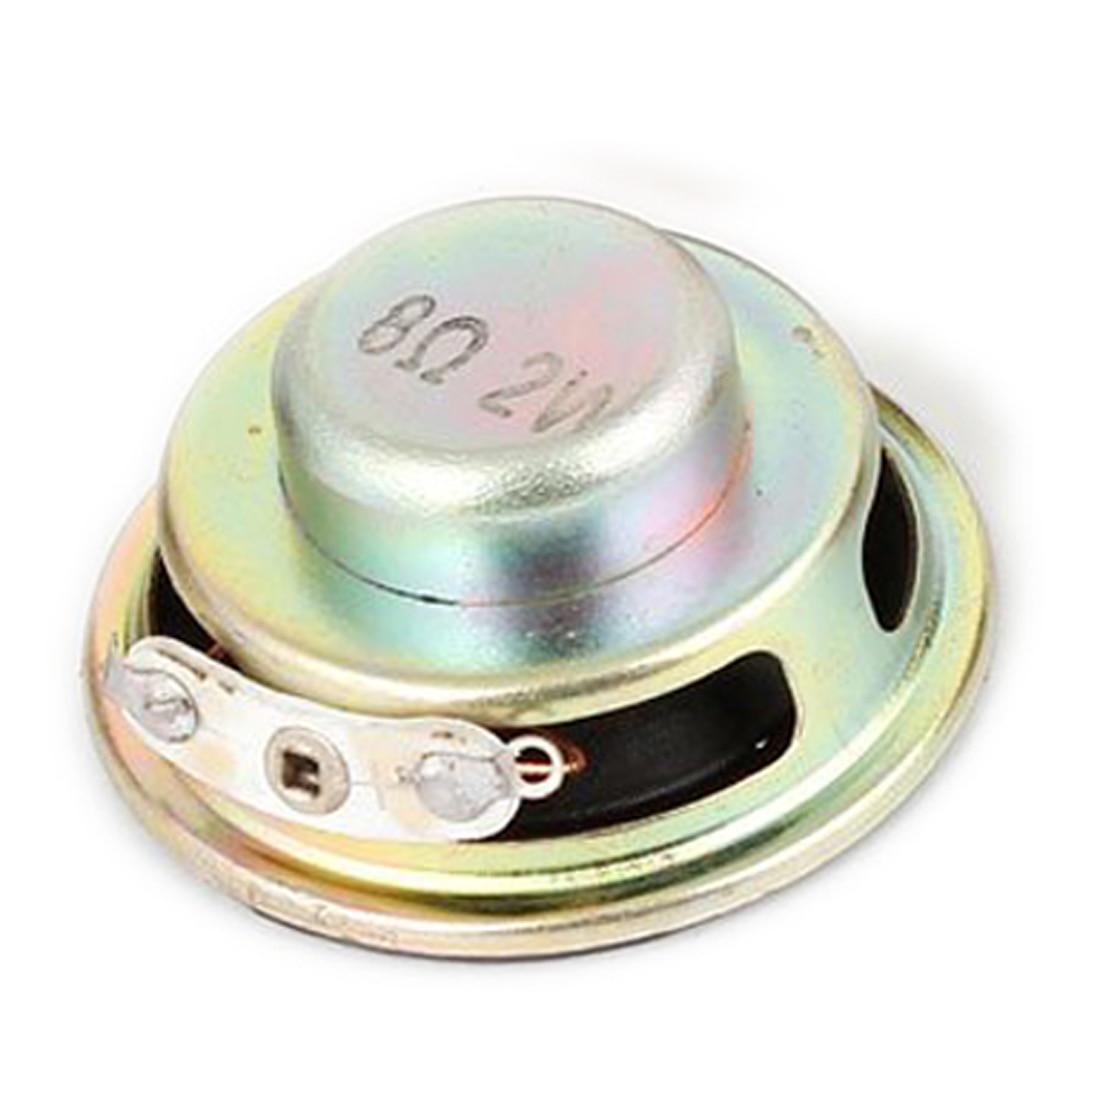 4 Pcs 36mm Dia Internal Speakers Magnet 8Ohm 2W For PC Laptop